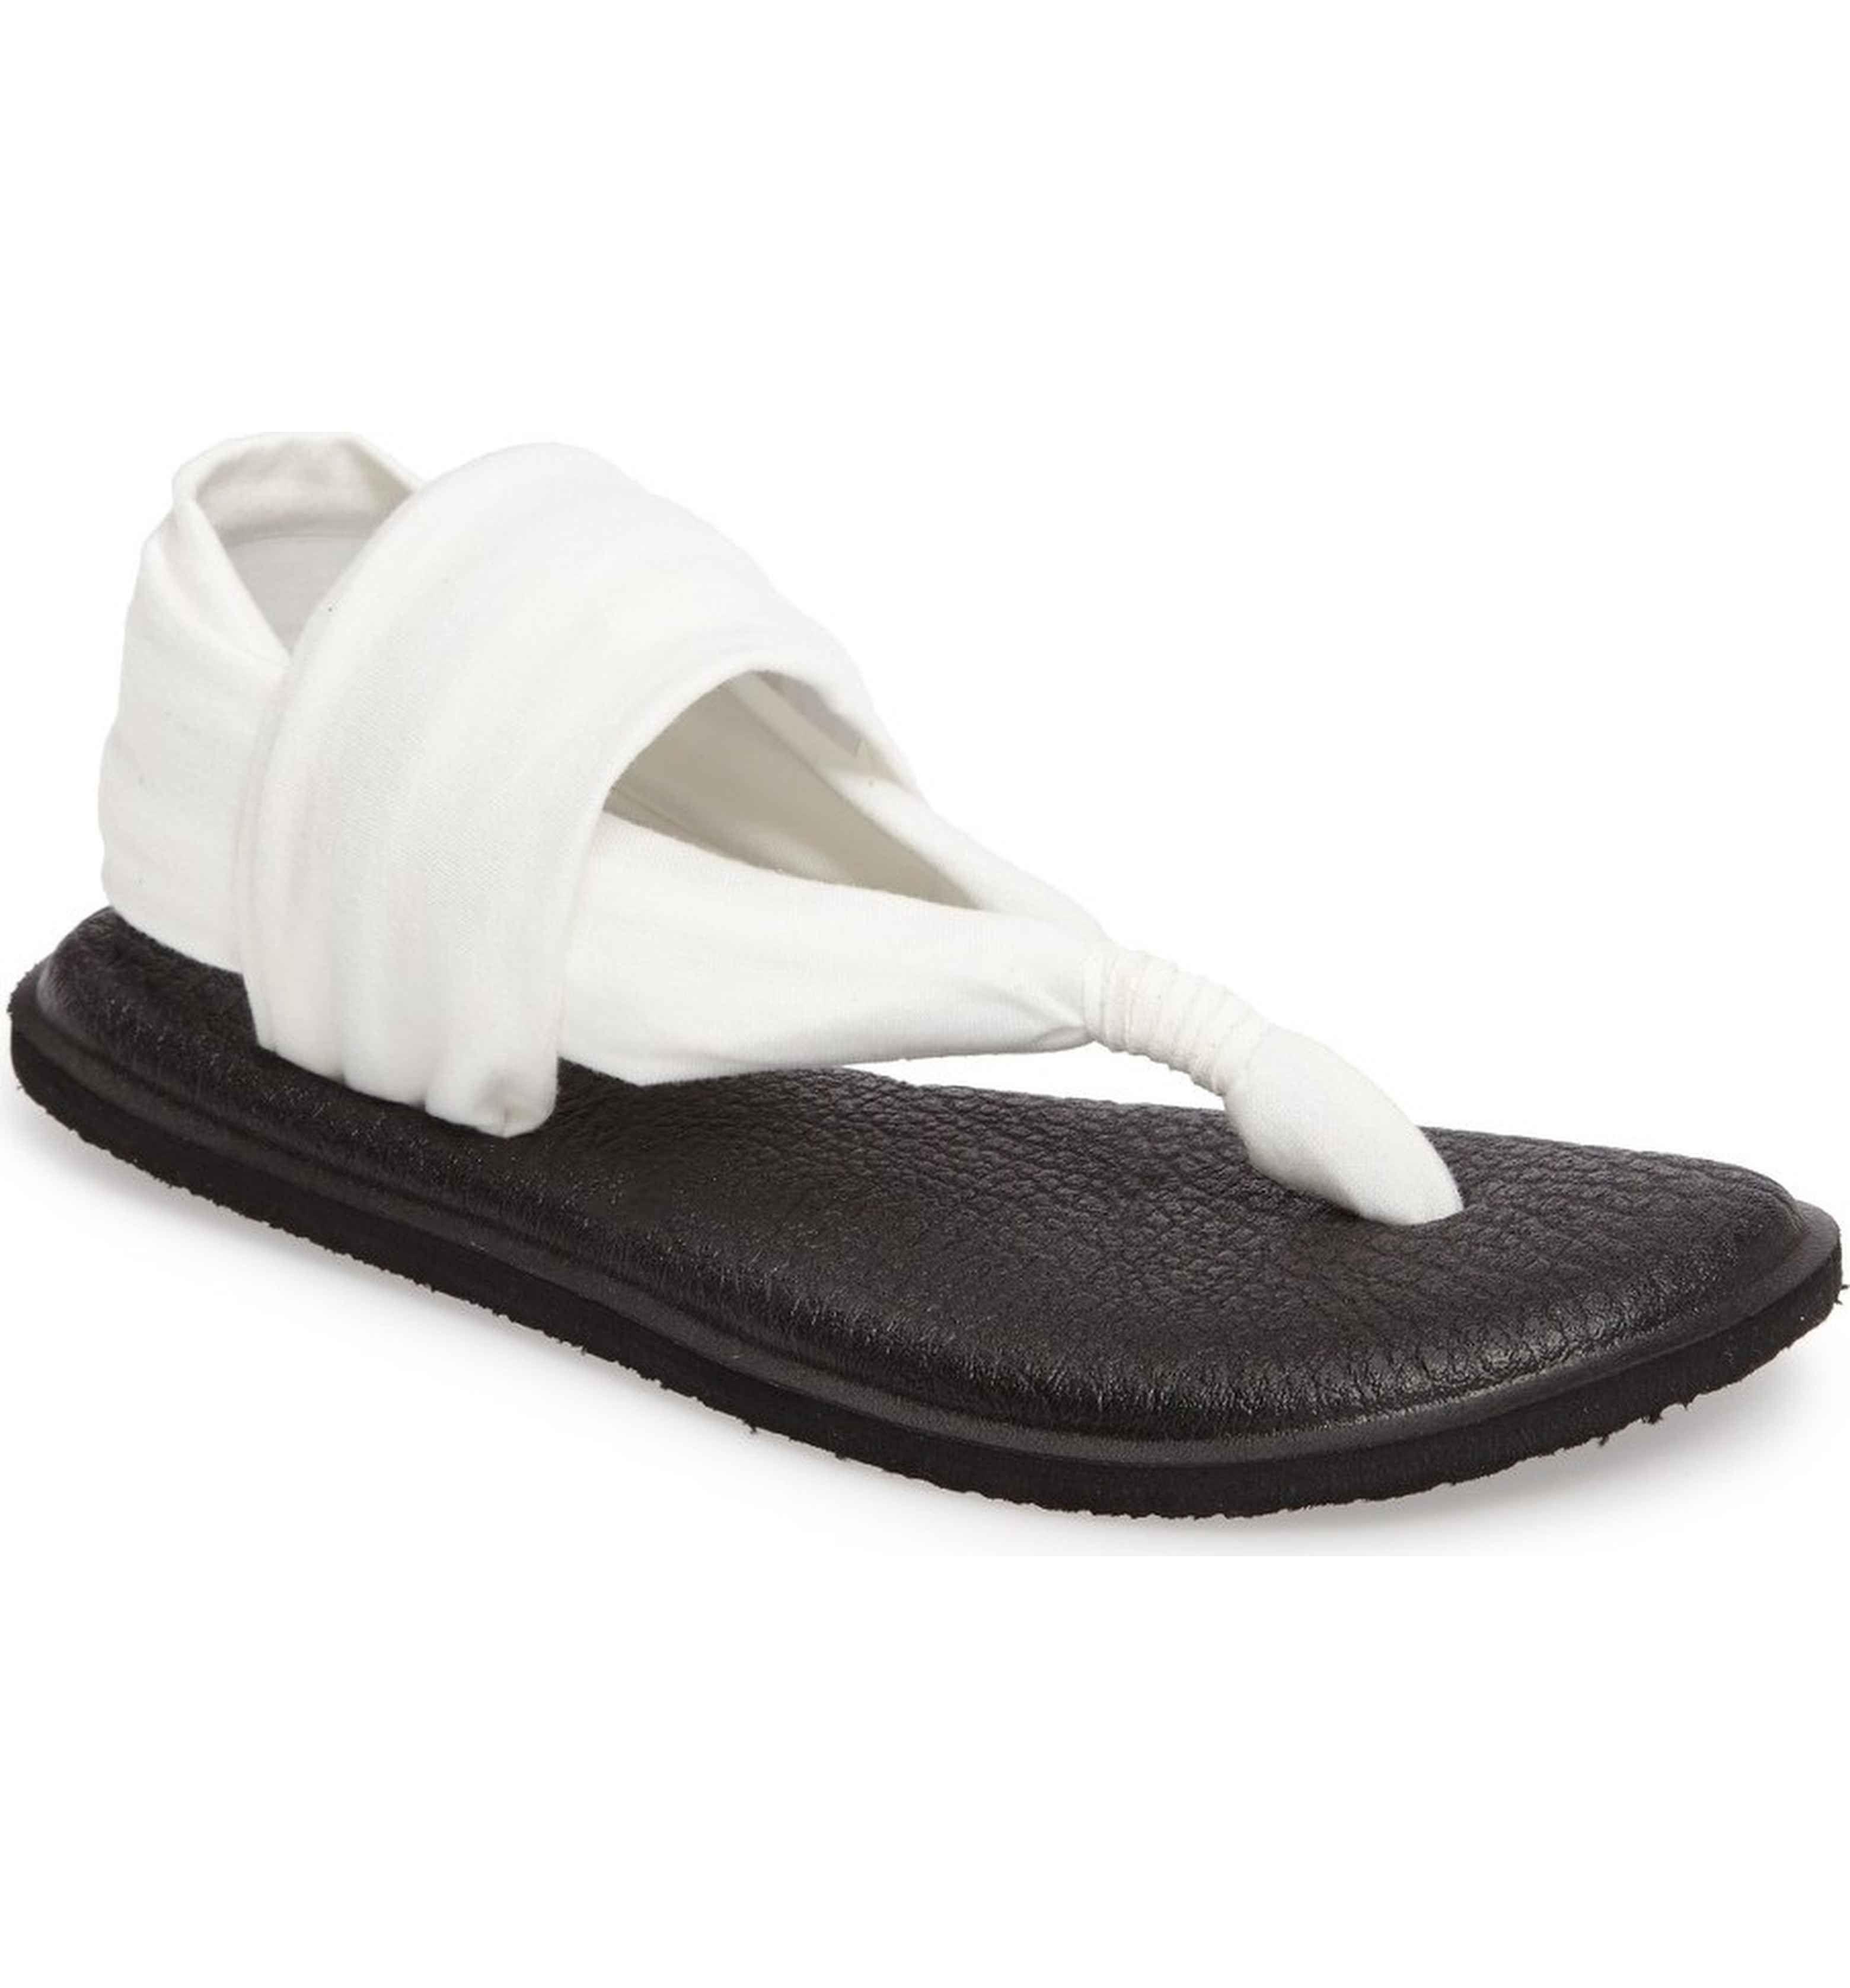 store sanuk womens spree yoga flip arcadian flop sandals product lime s specialty outdoor women wms sale mats shop mat